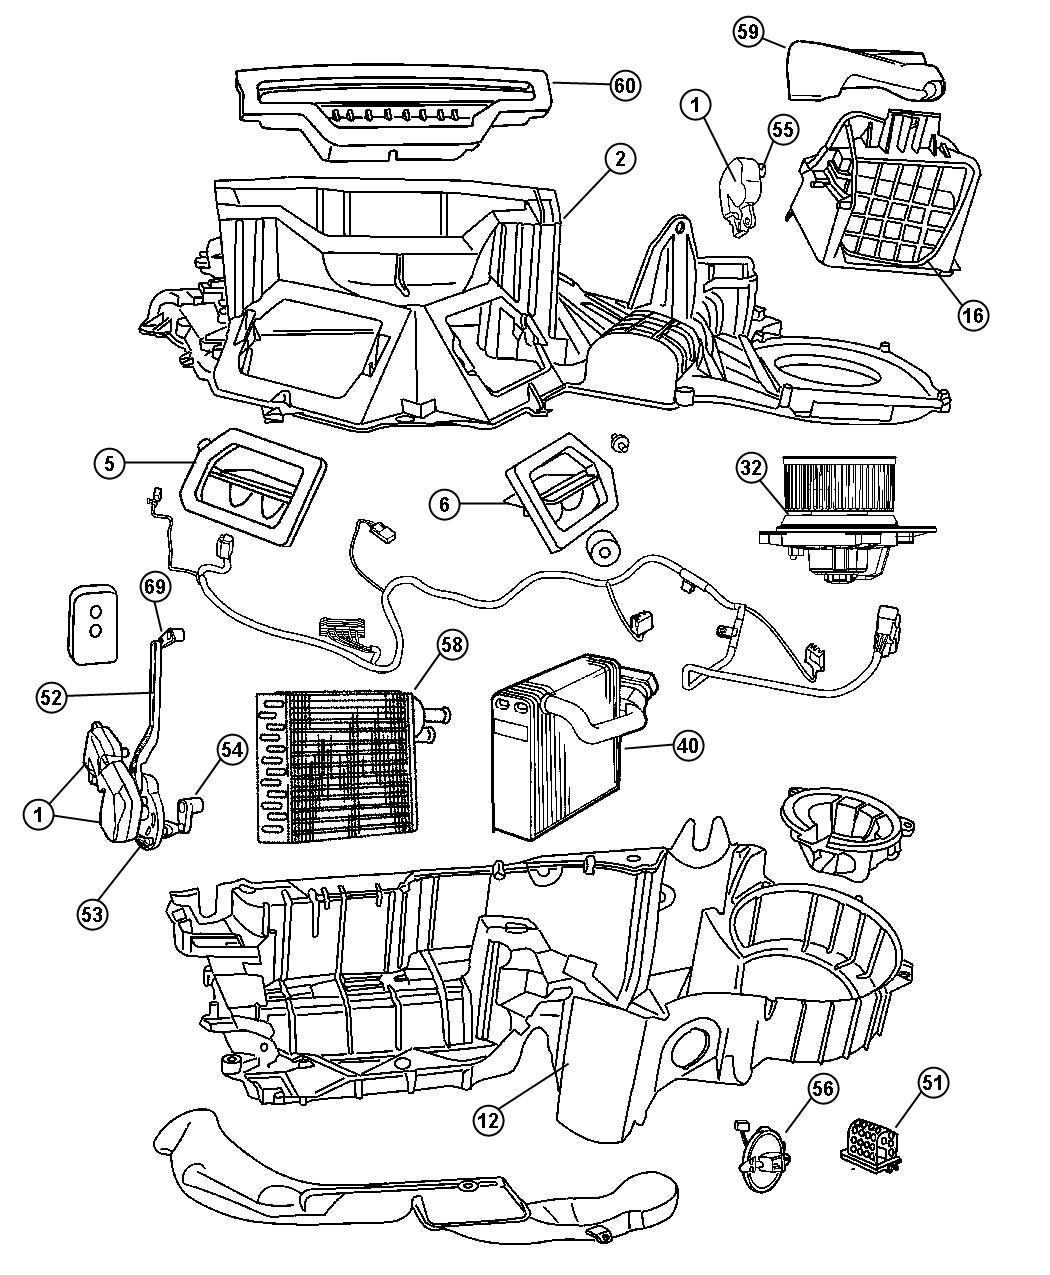 Dodge Dakota Heater And Air Conditioning Unit